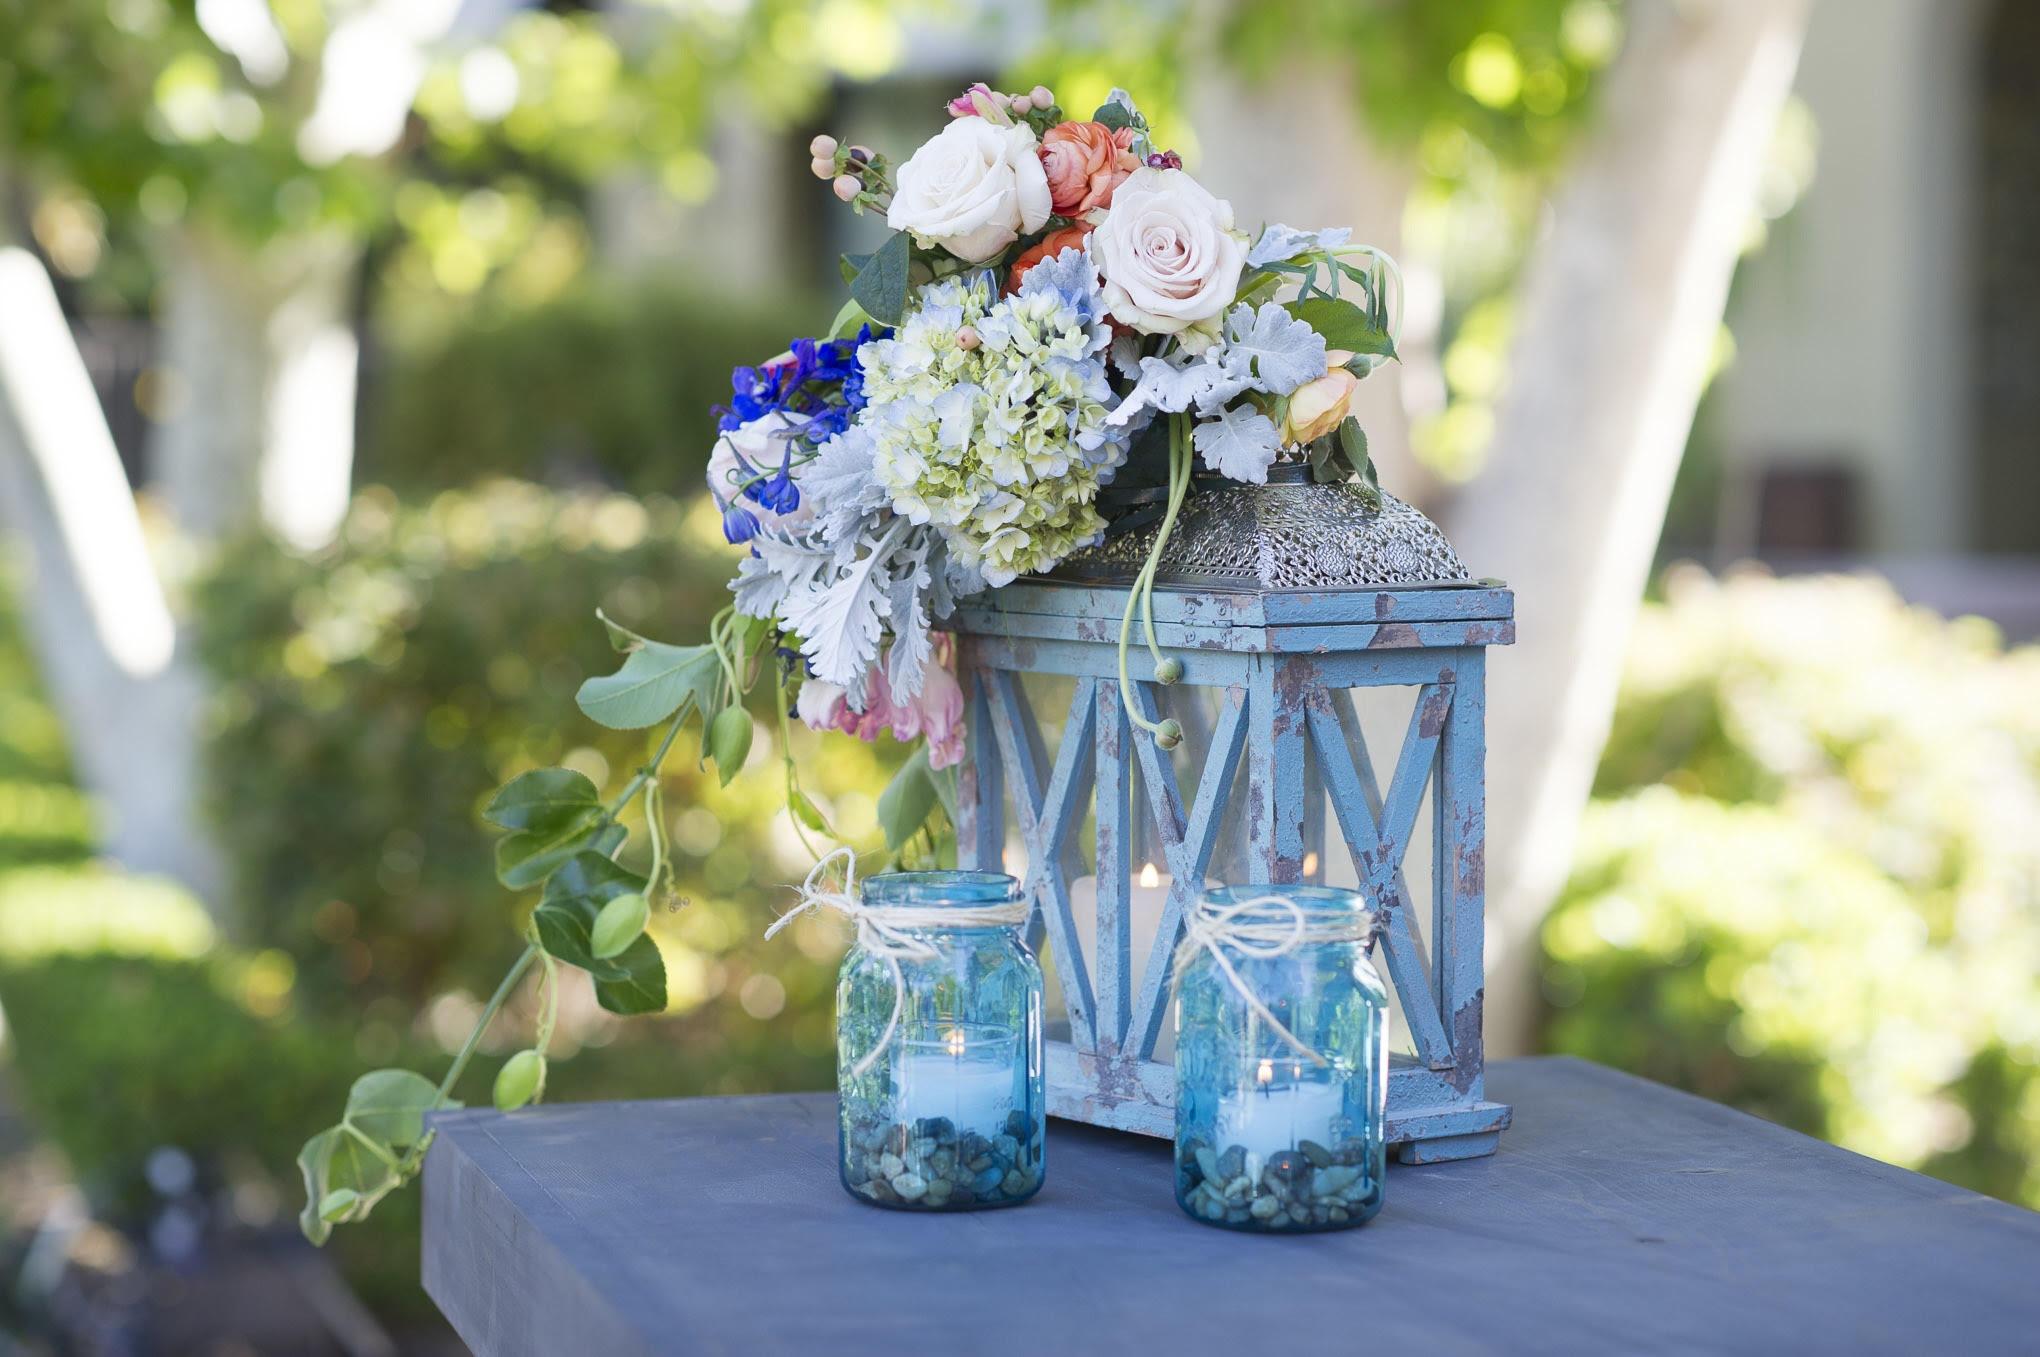 Floral Design & Custom Arrangements